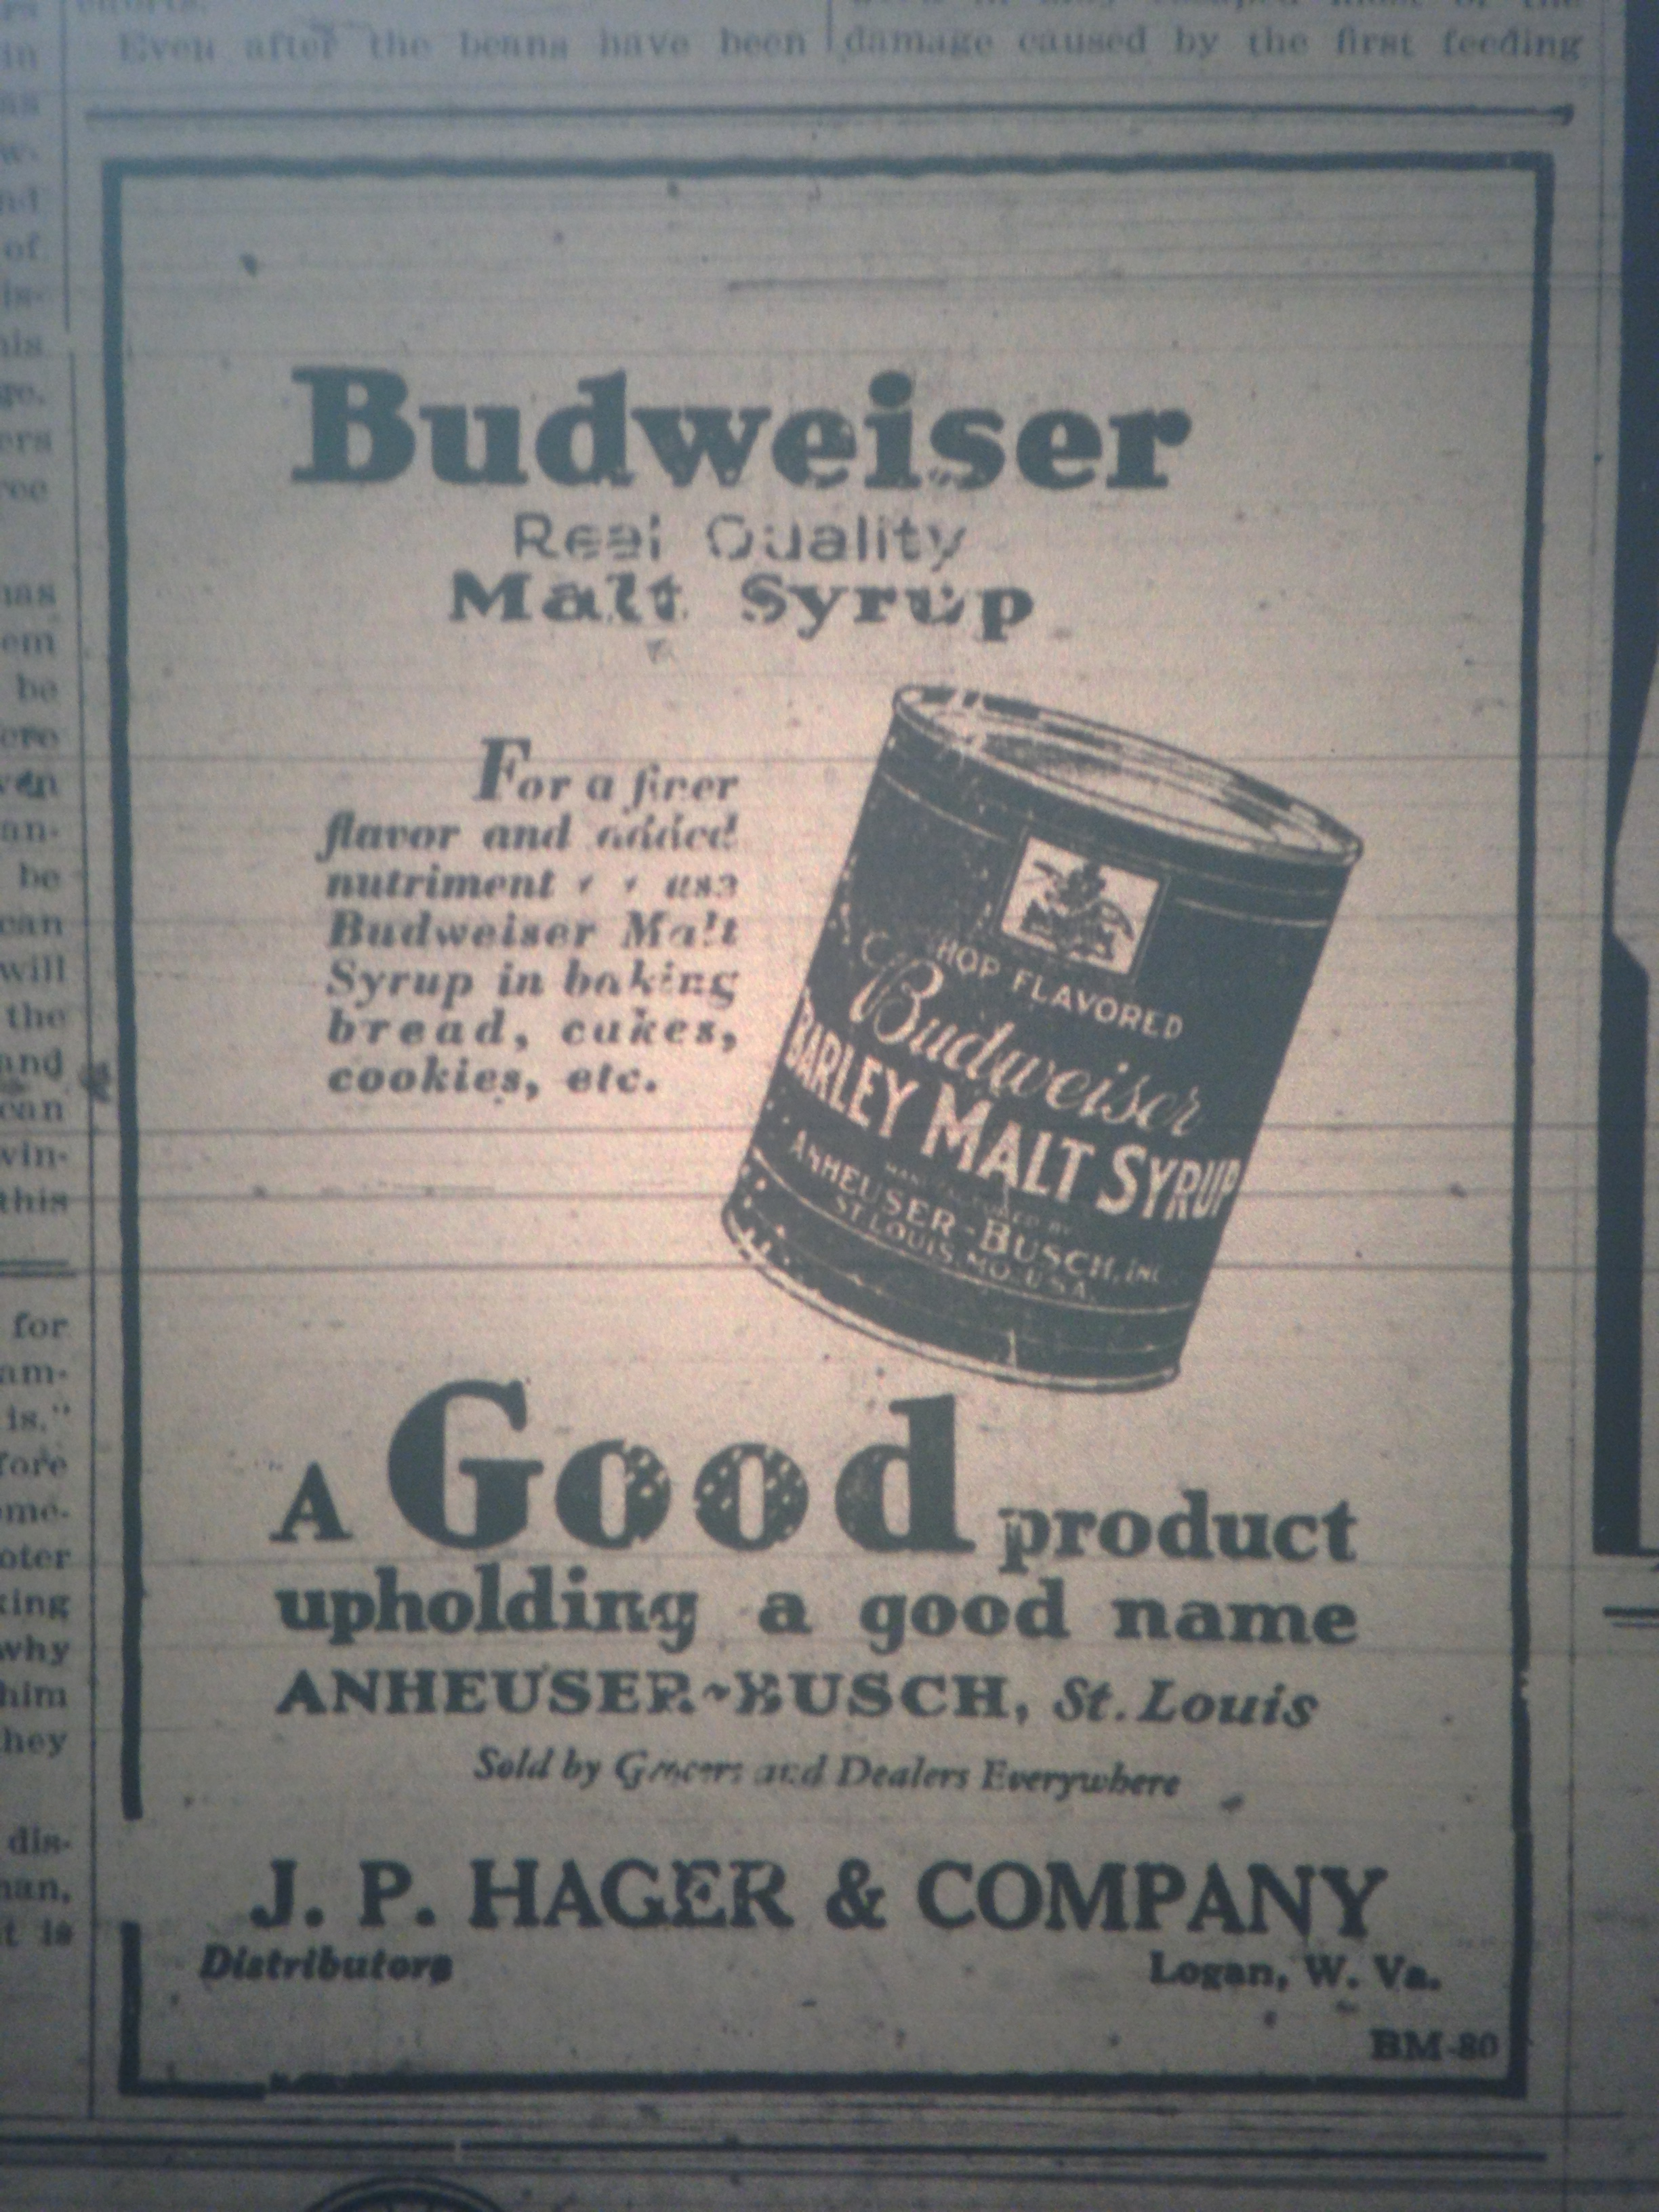 Budweiser Ad LB 06.08.1928.JPG